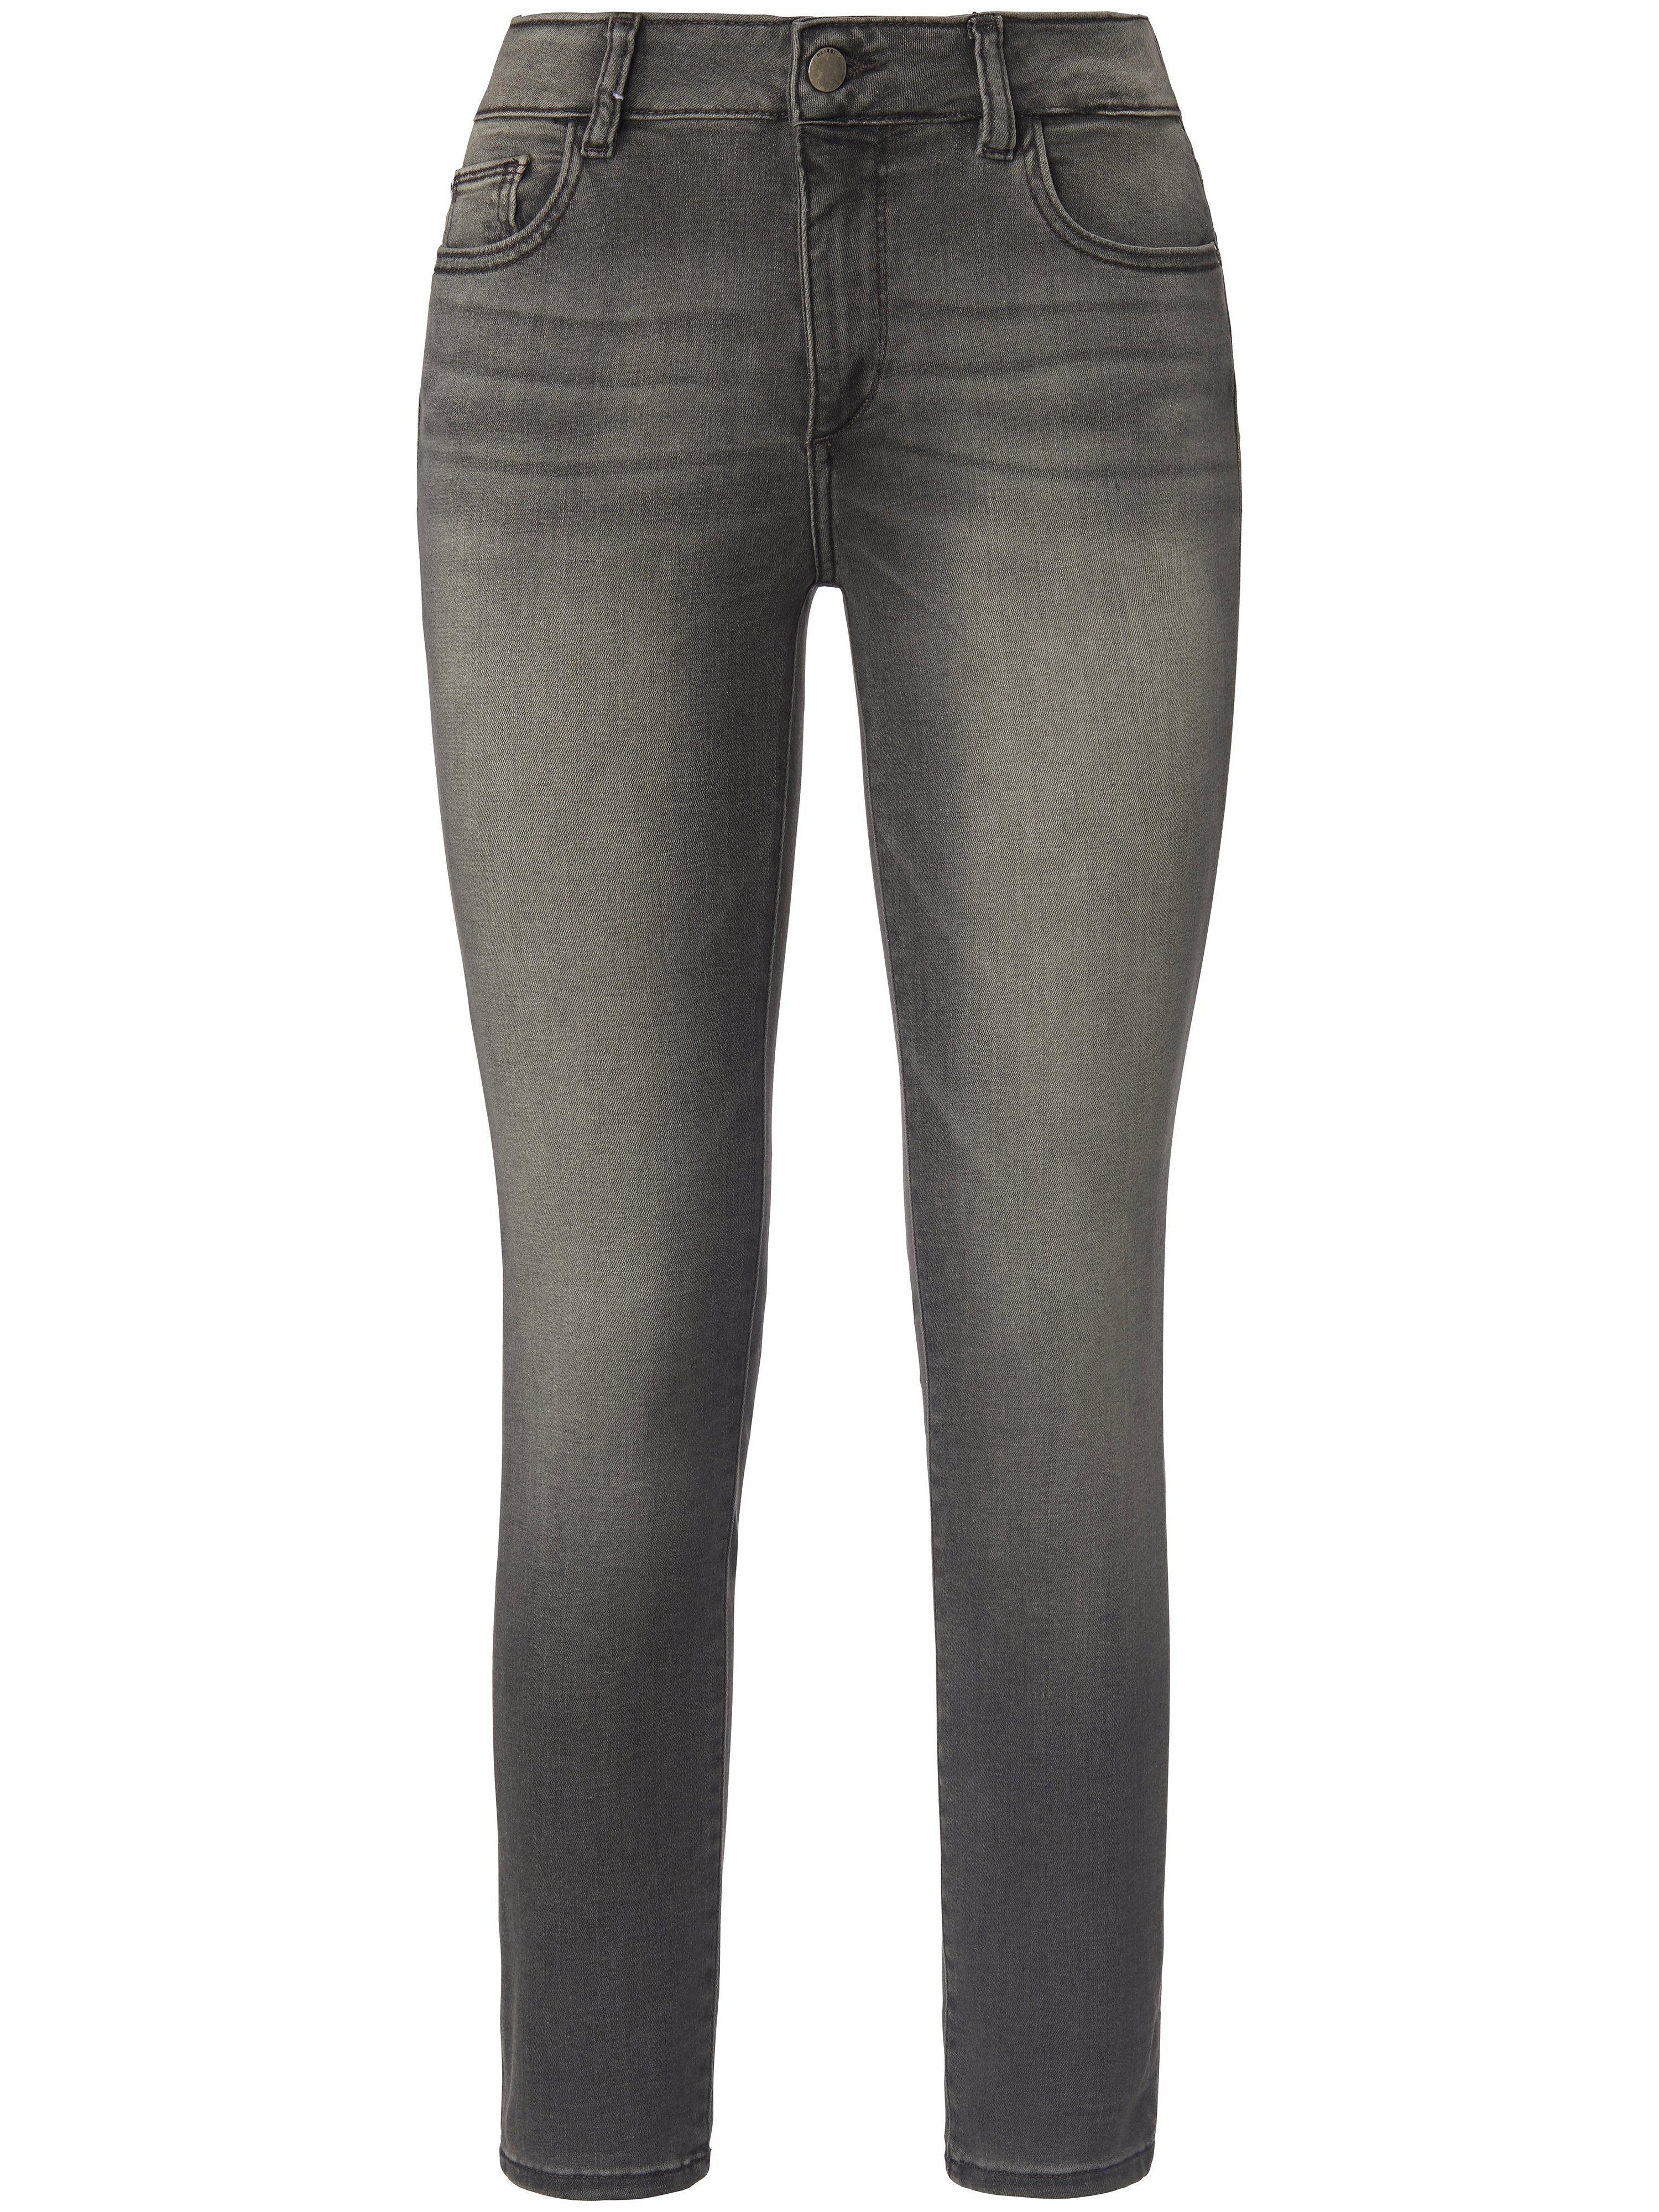 Enkellange 7/8-jeans model FLORENCE Van DL1961 denim